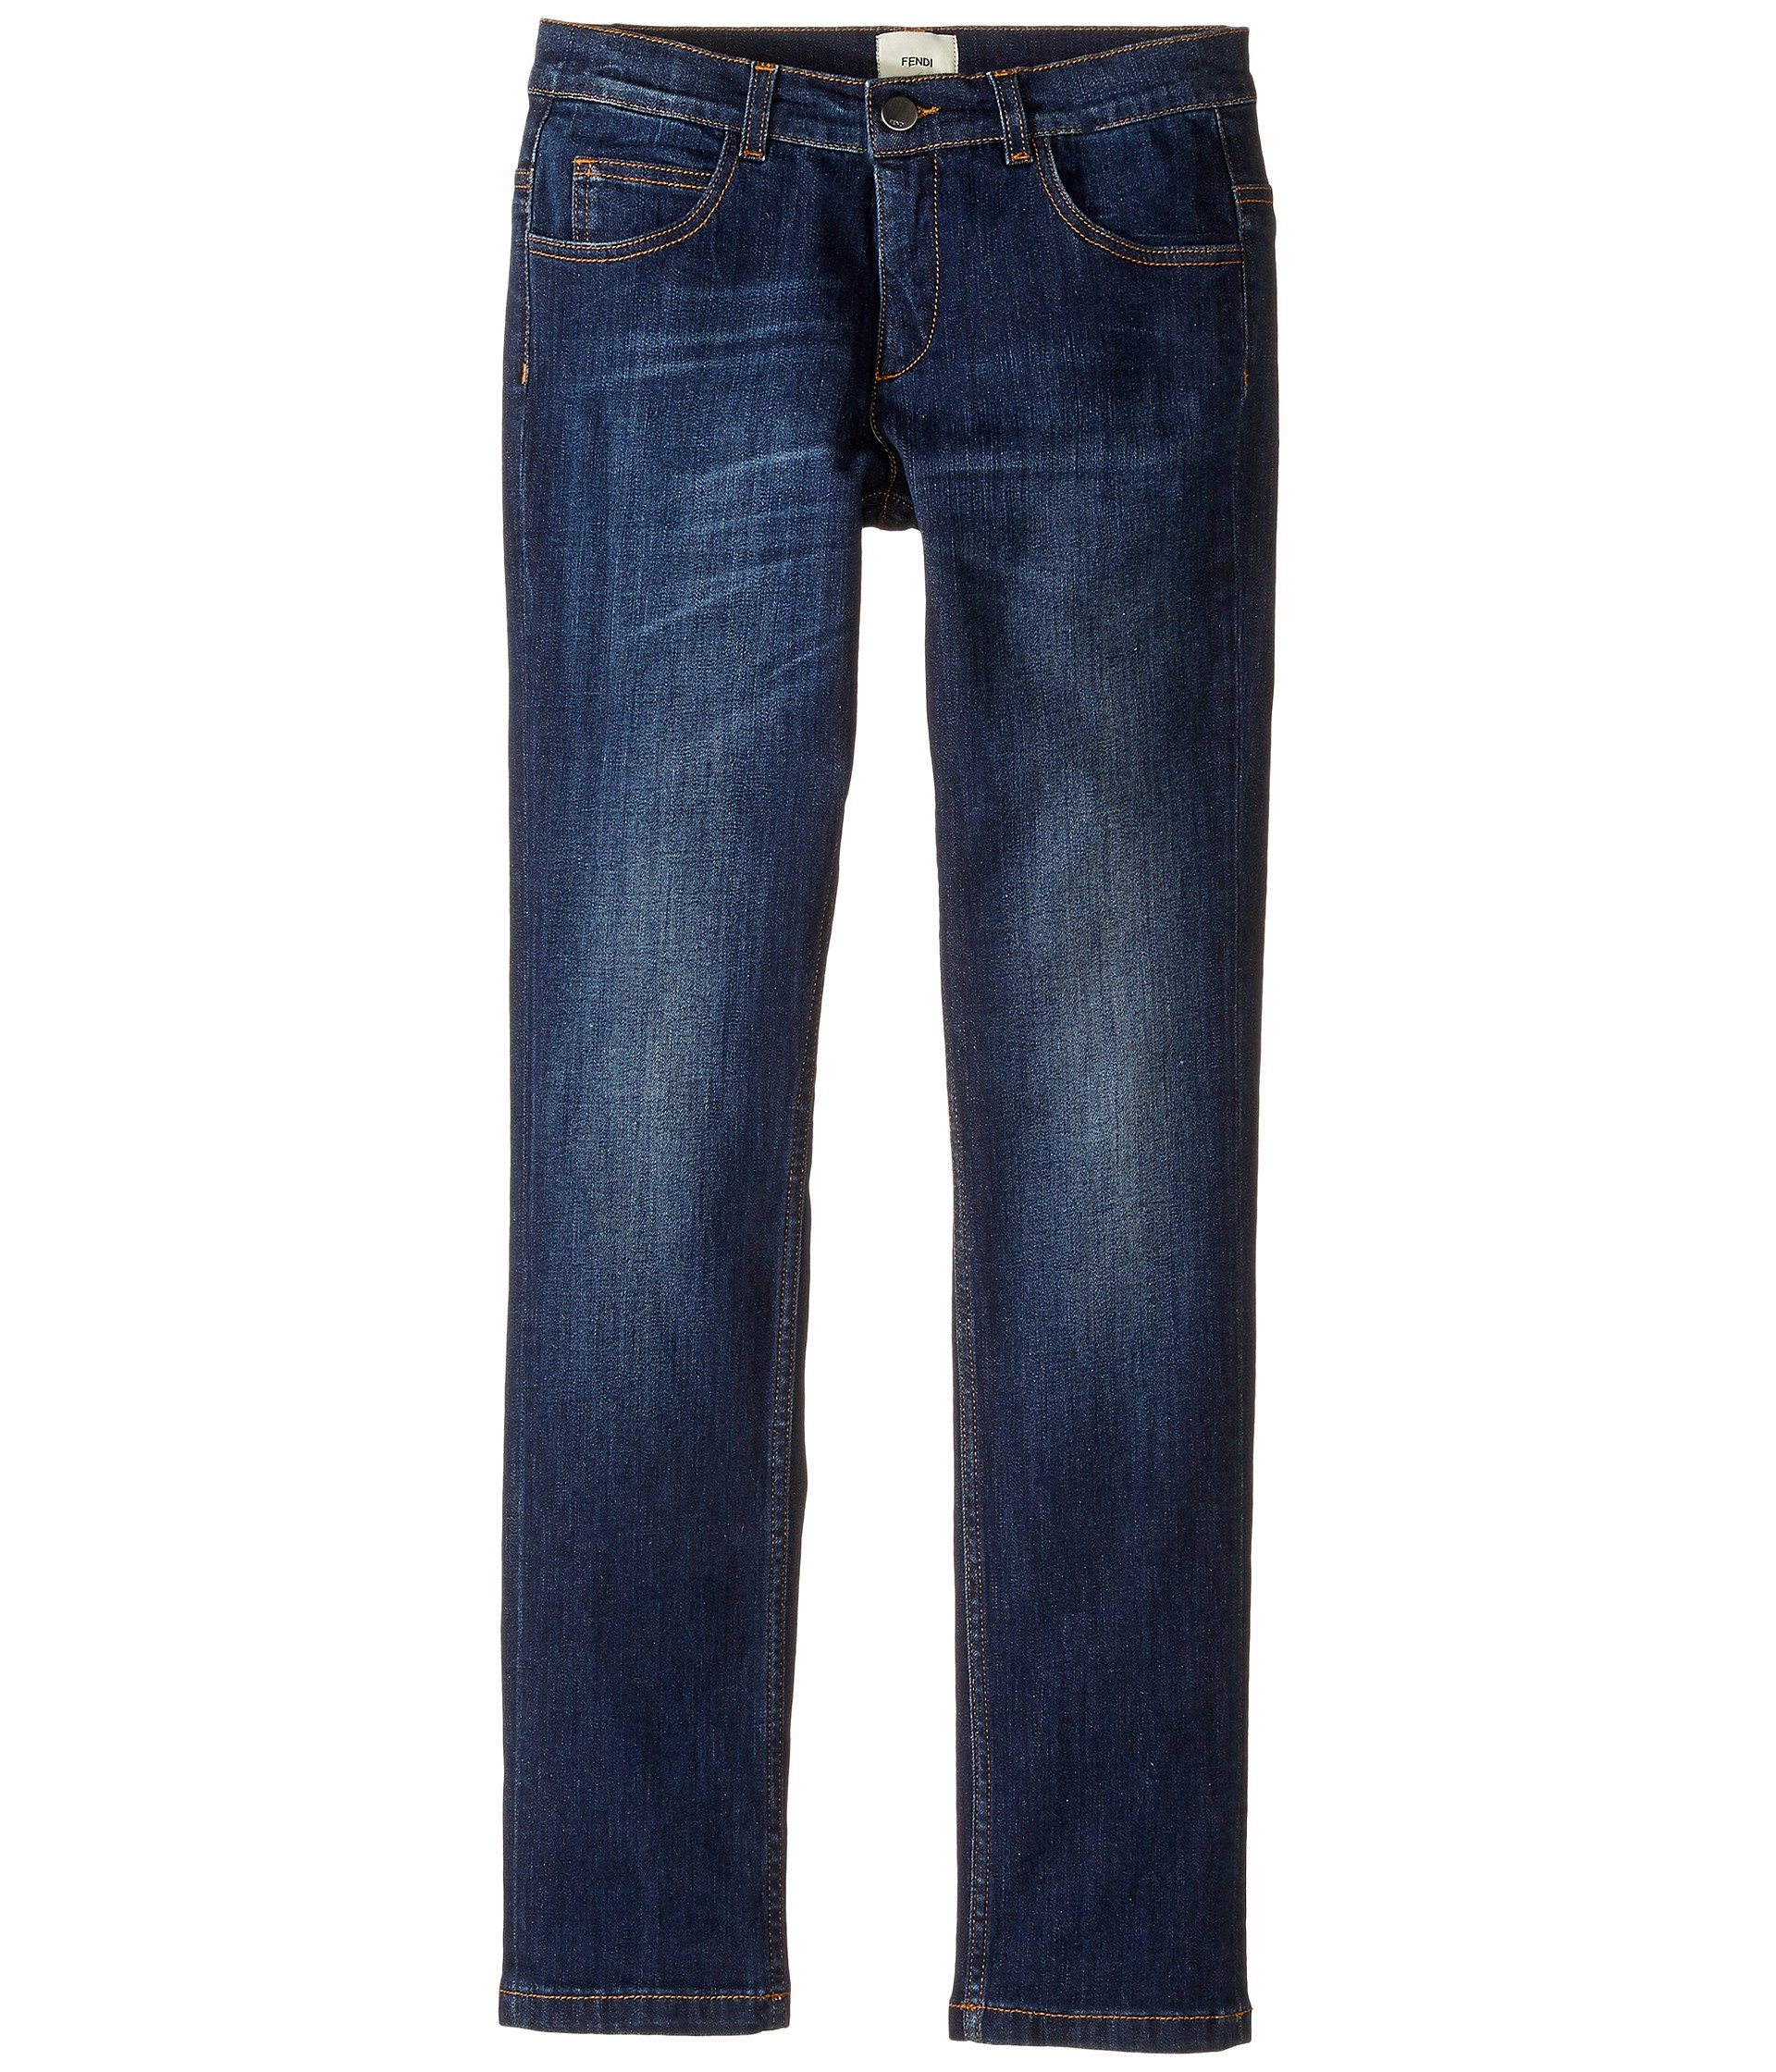 Fendi Kids Boys' Denim Pants With Monster Logo Back Pocket (Big Kids), Blue Denim, 12 Years X One Size